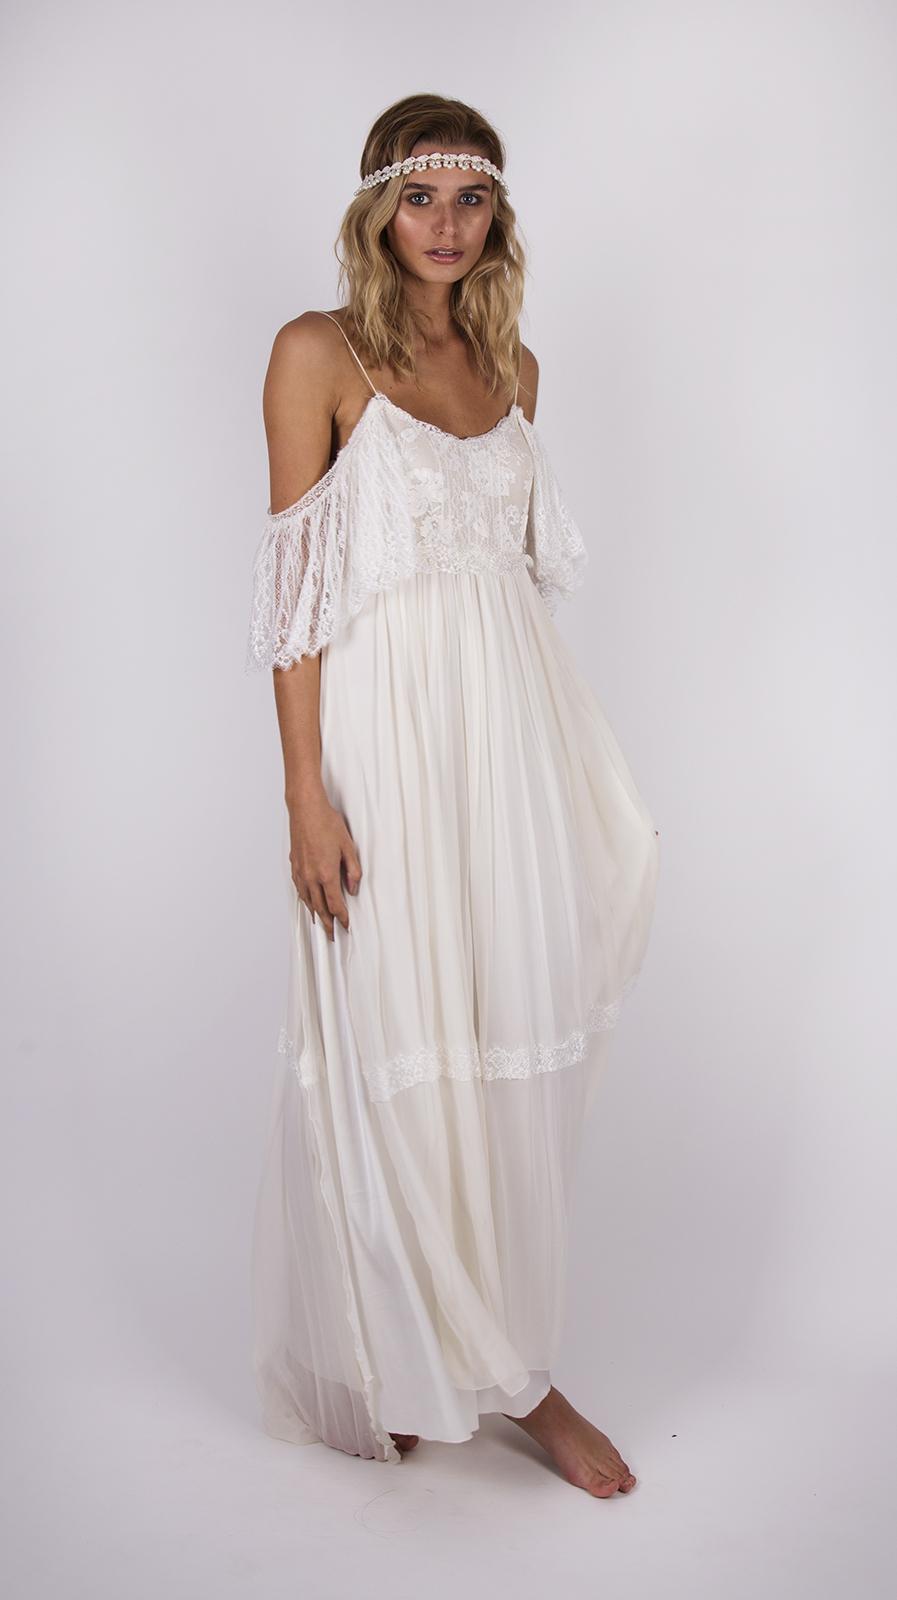 Bohemian lace wedding dress australia wedding dresses asian for Boho wedding dresses australia